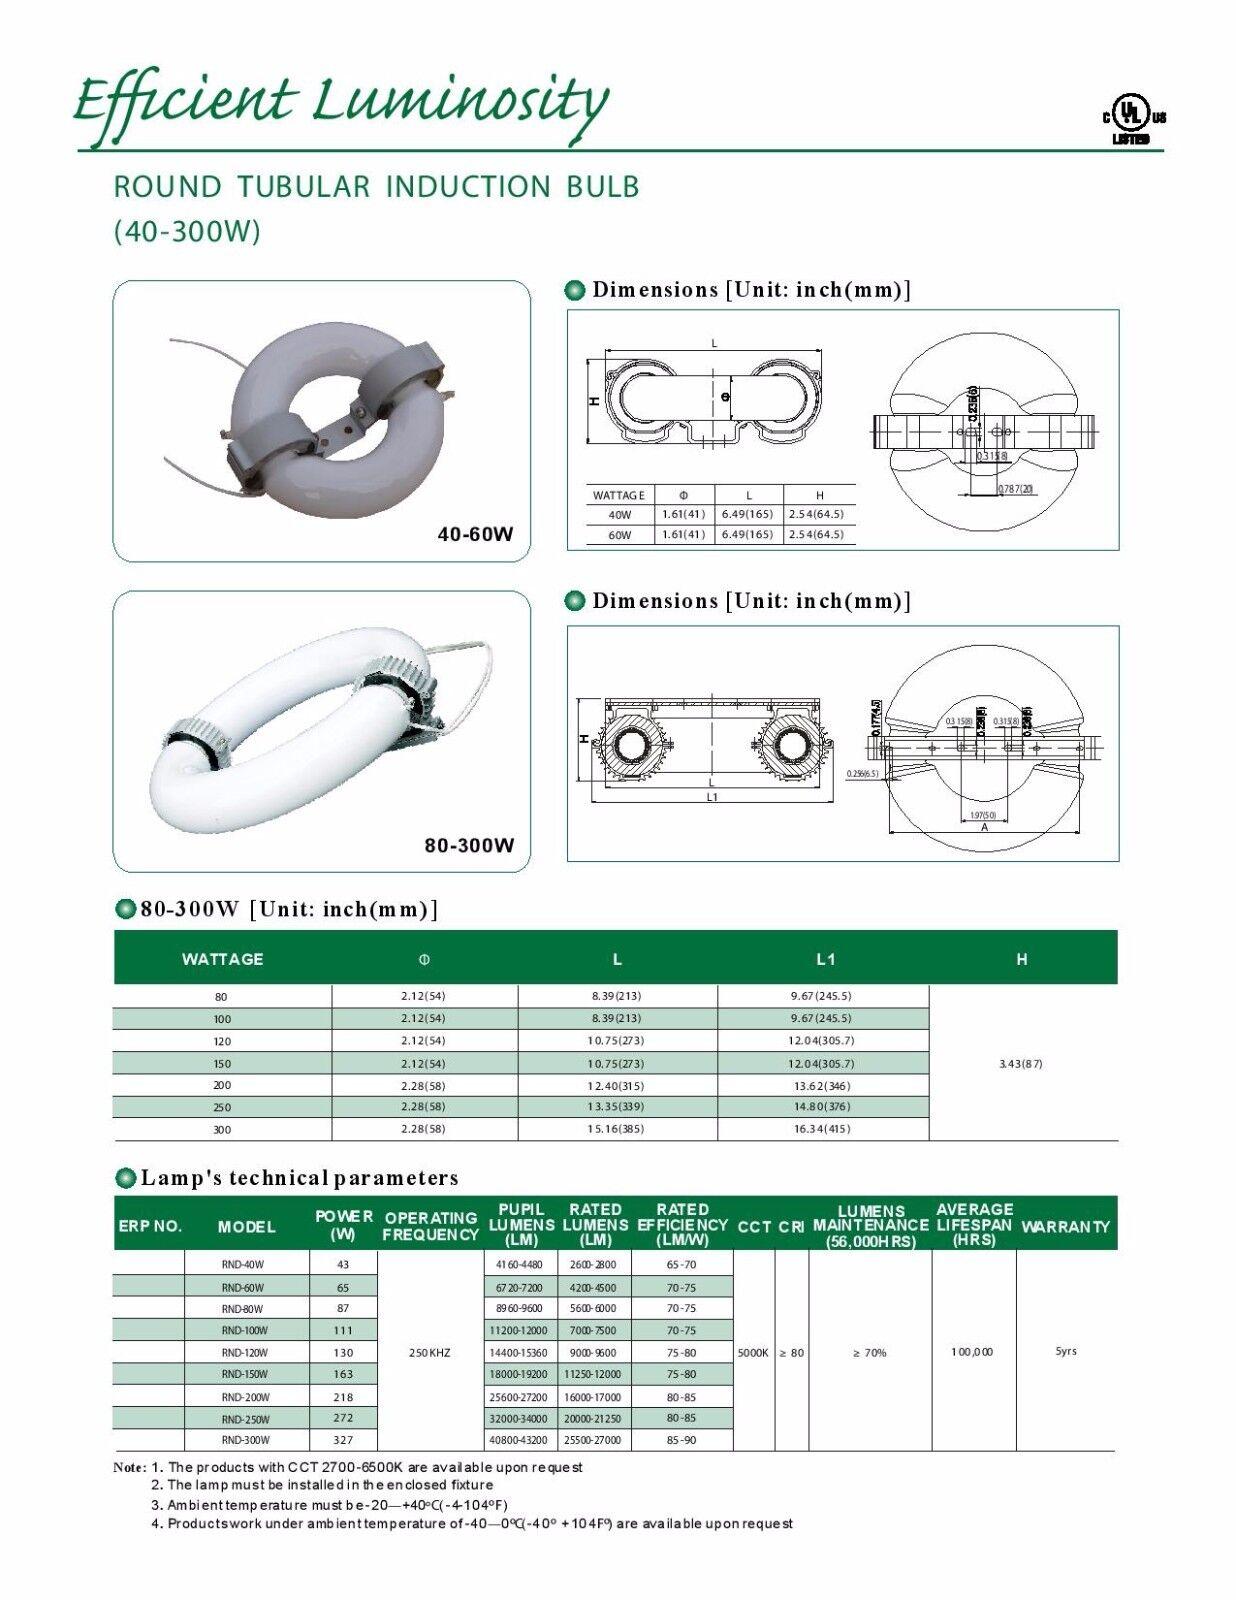 150W INDUCTION LAMP Circular Round Light 5000K 80CRI American GreenPower E2-150